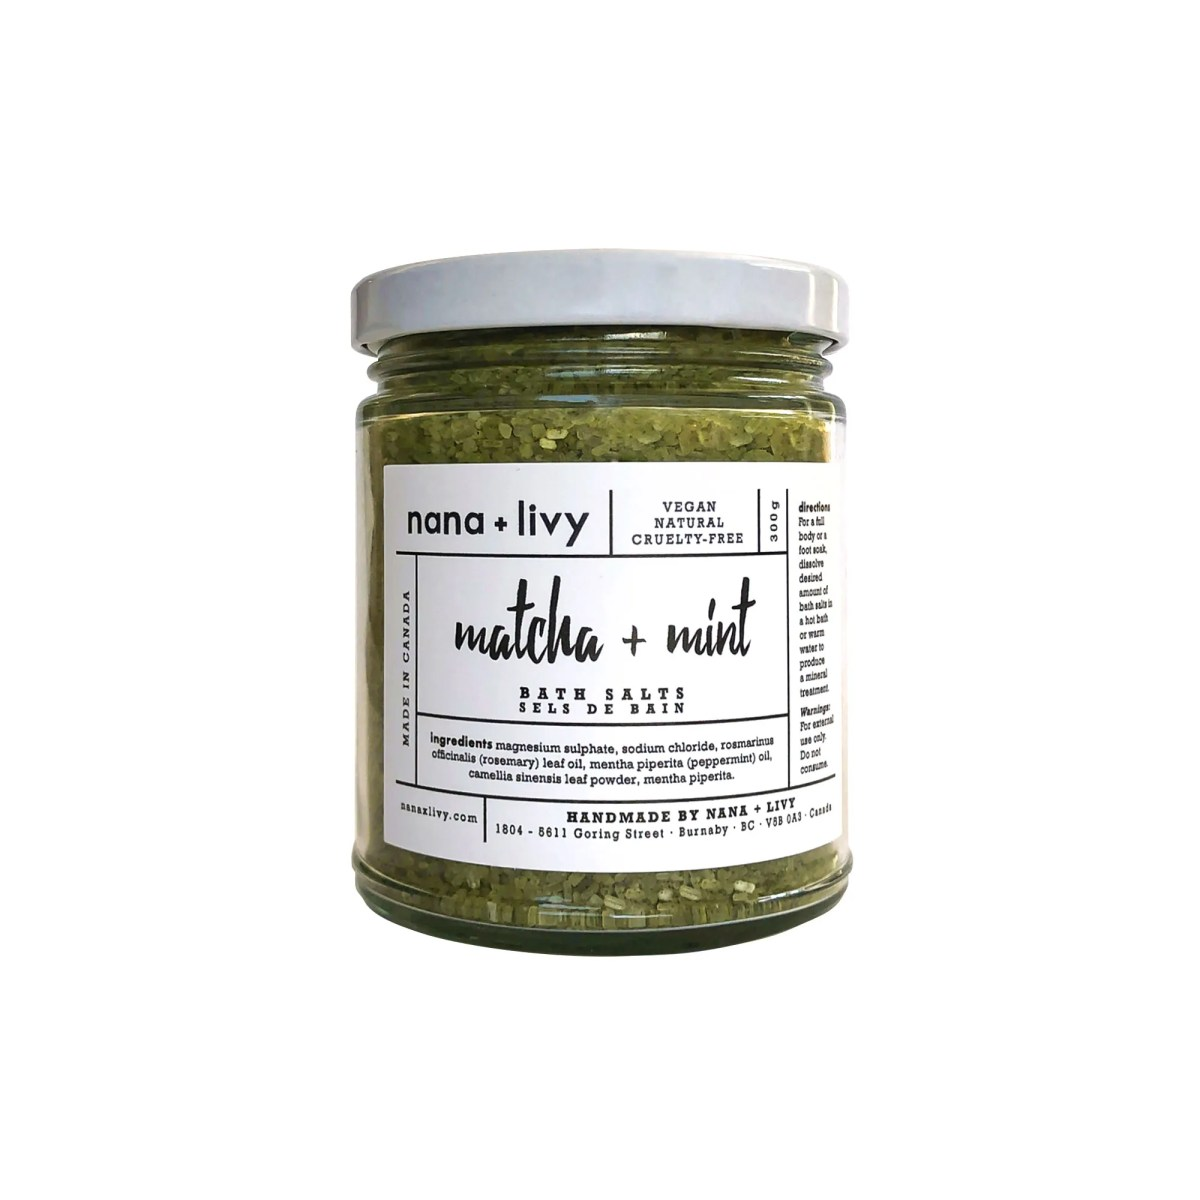 Matcha + Mint Bath Salts